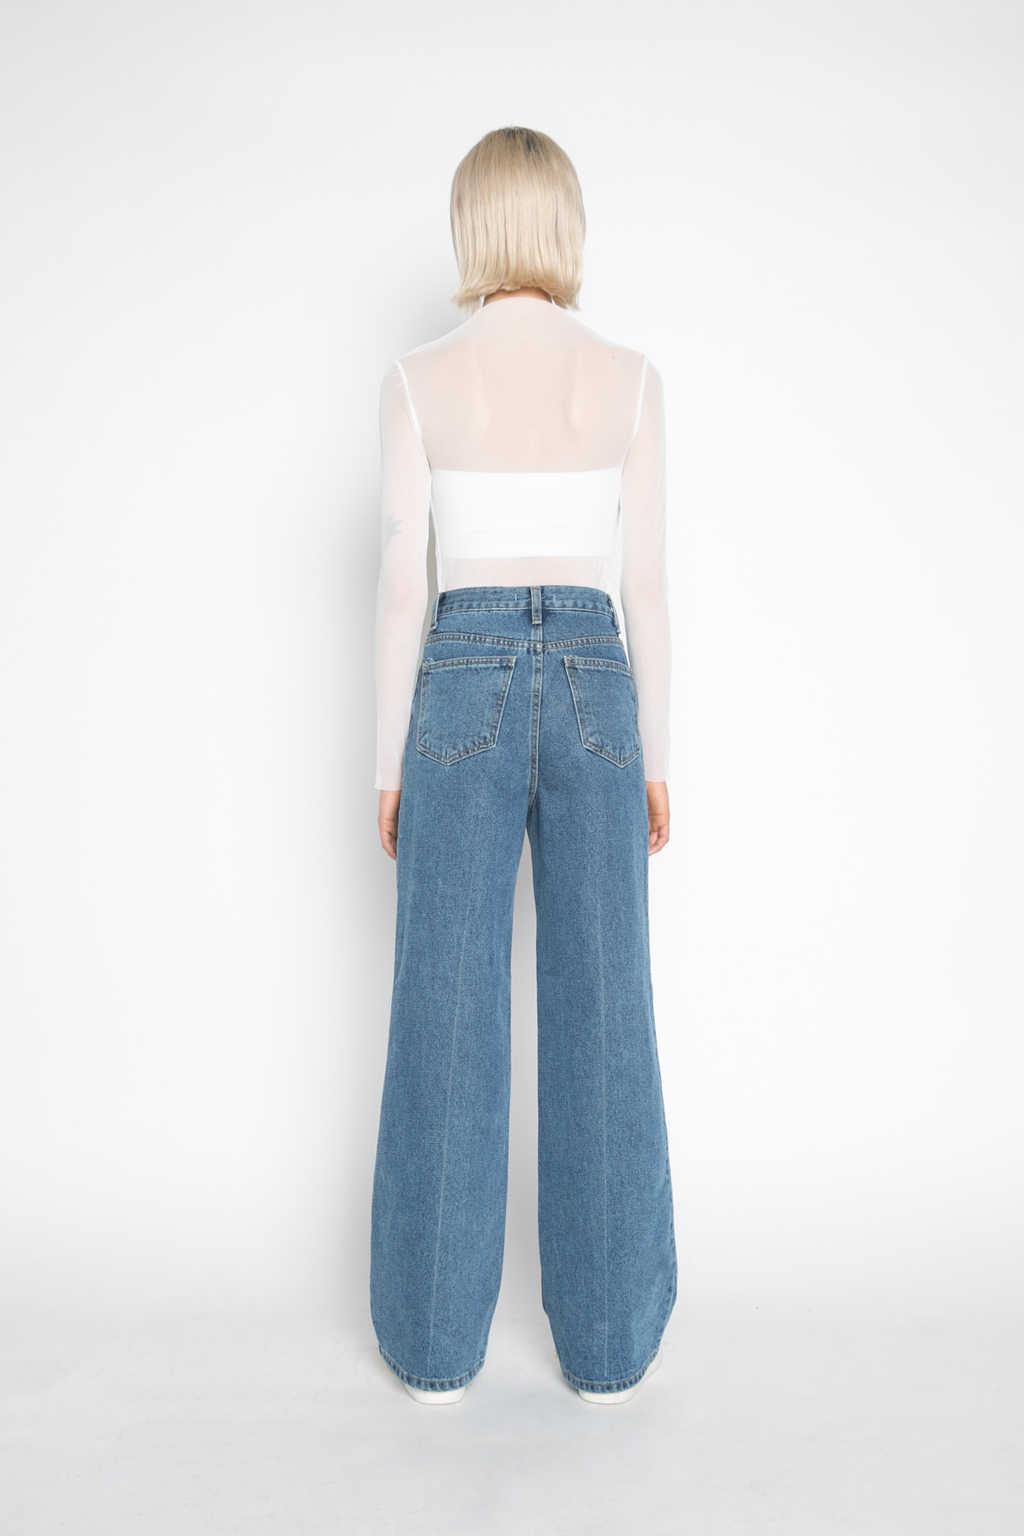 Vintage Jean H008 Indigo 4